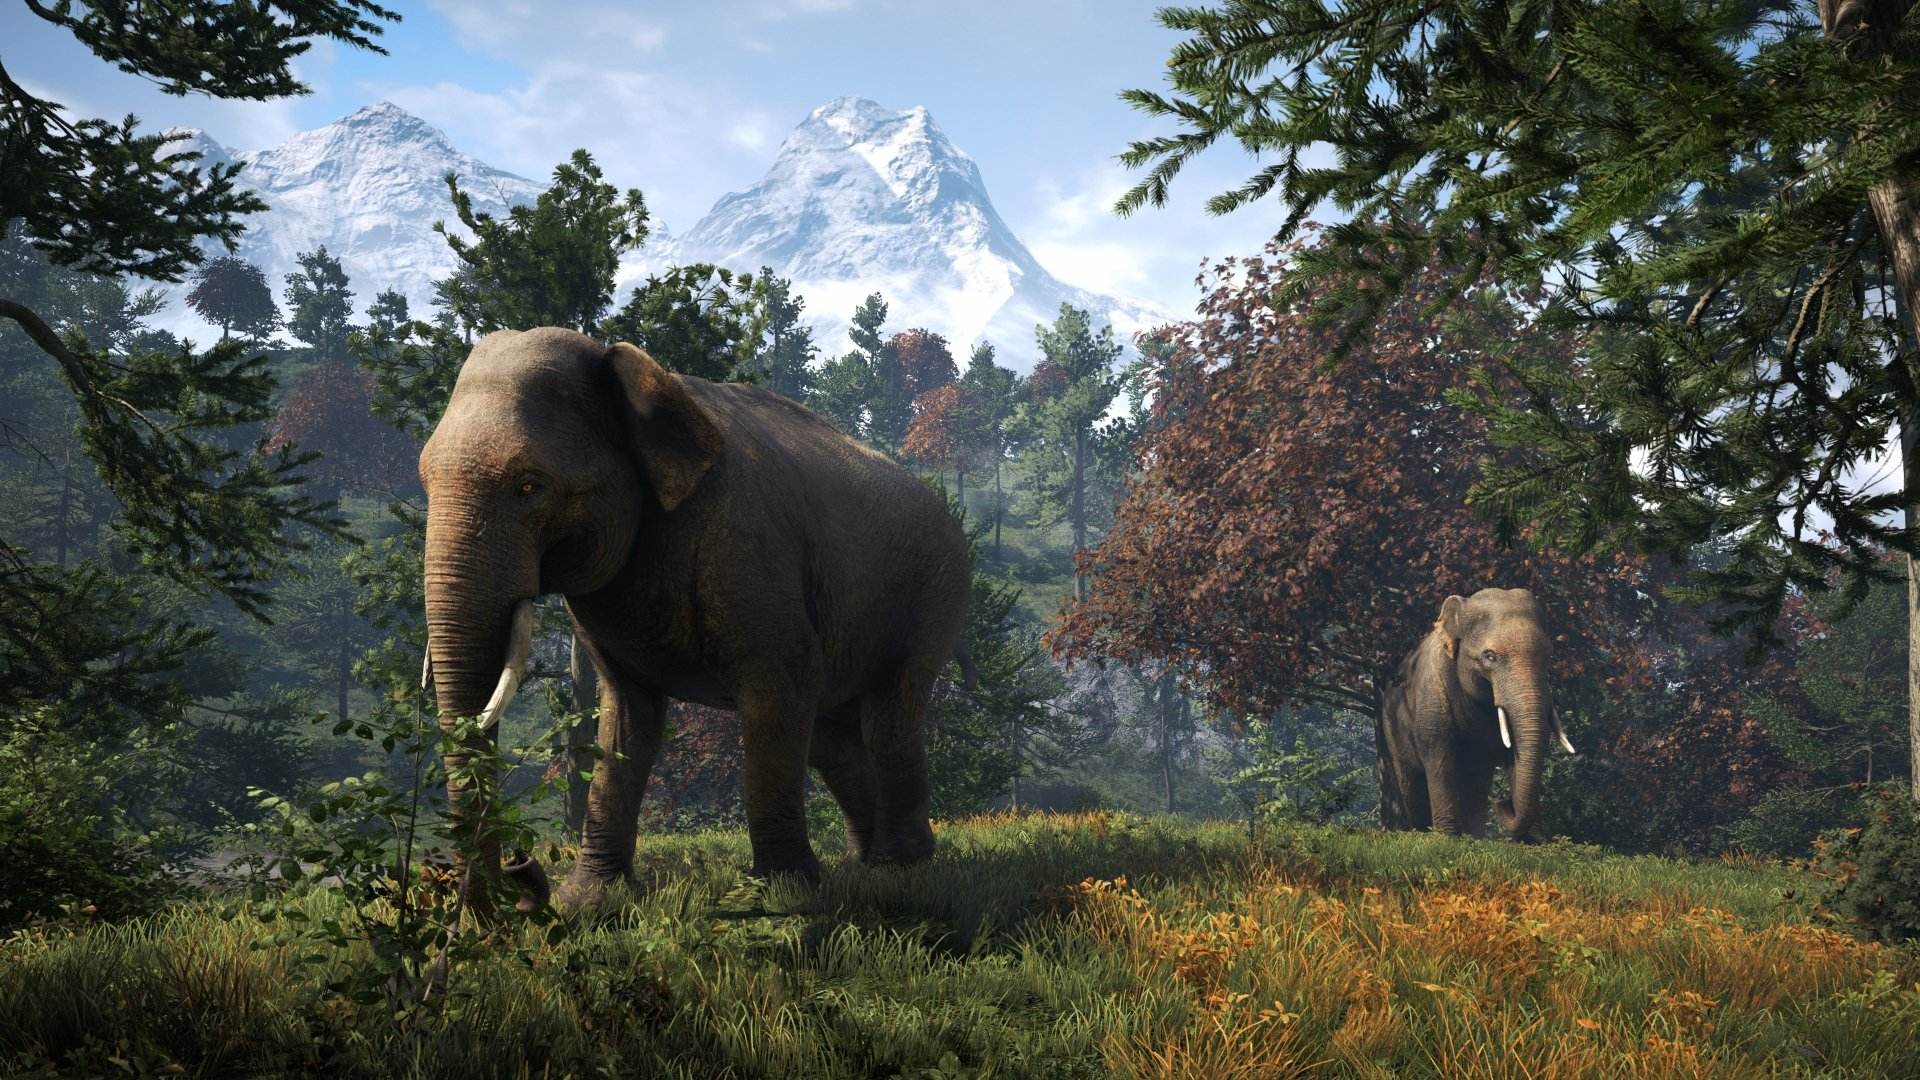 Far Cry 4 Wallpaper Elephant: Far Cry 4 4k Ultra HD Wallpaper